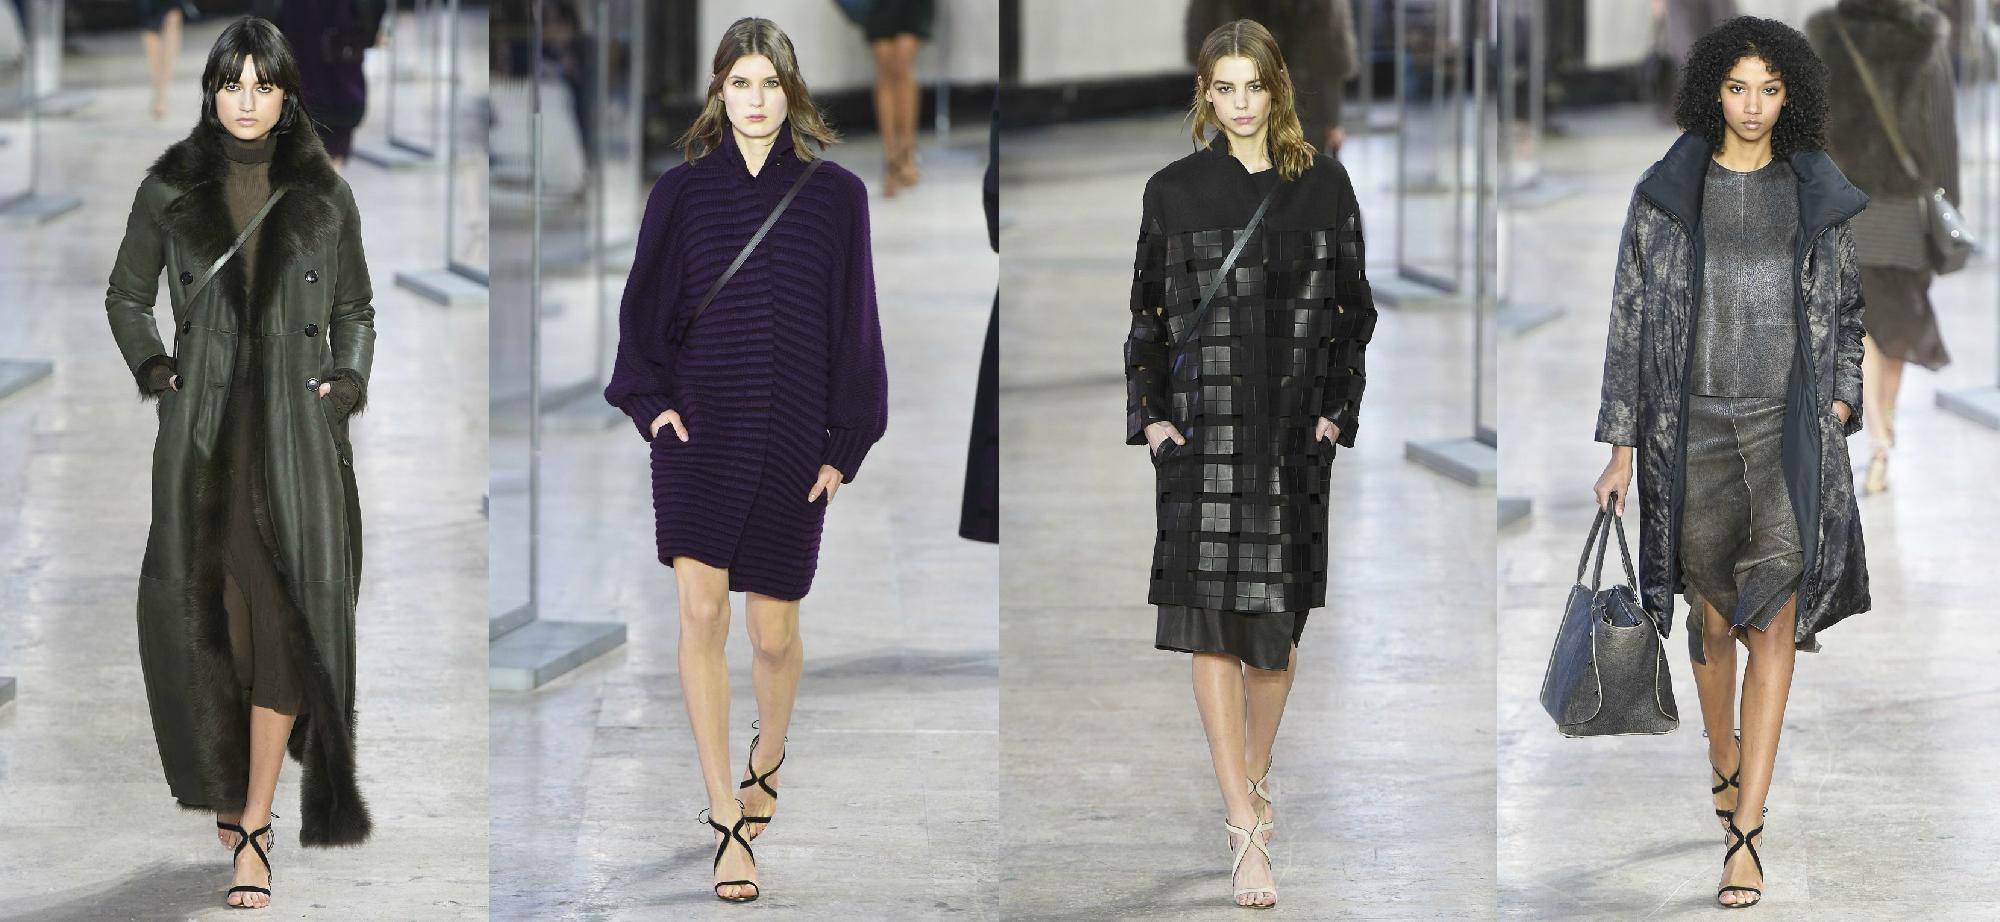 Akris Осень-Зима 2017 Модные тенденции